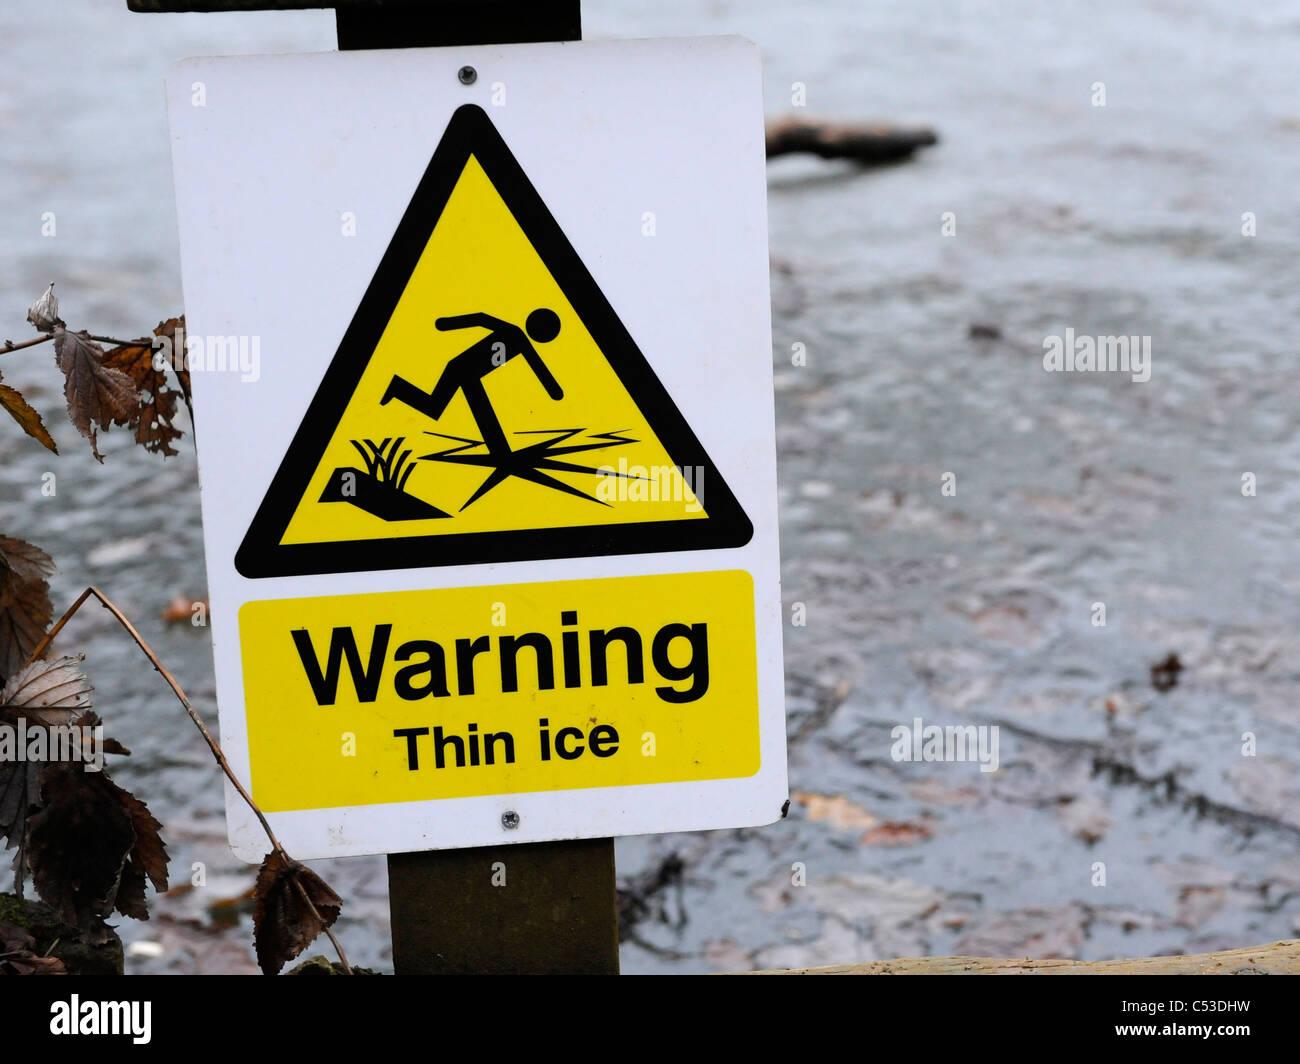 Warning sign - thin ice. - Stock Image